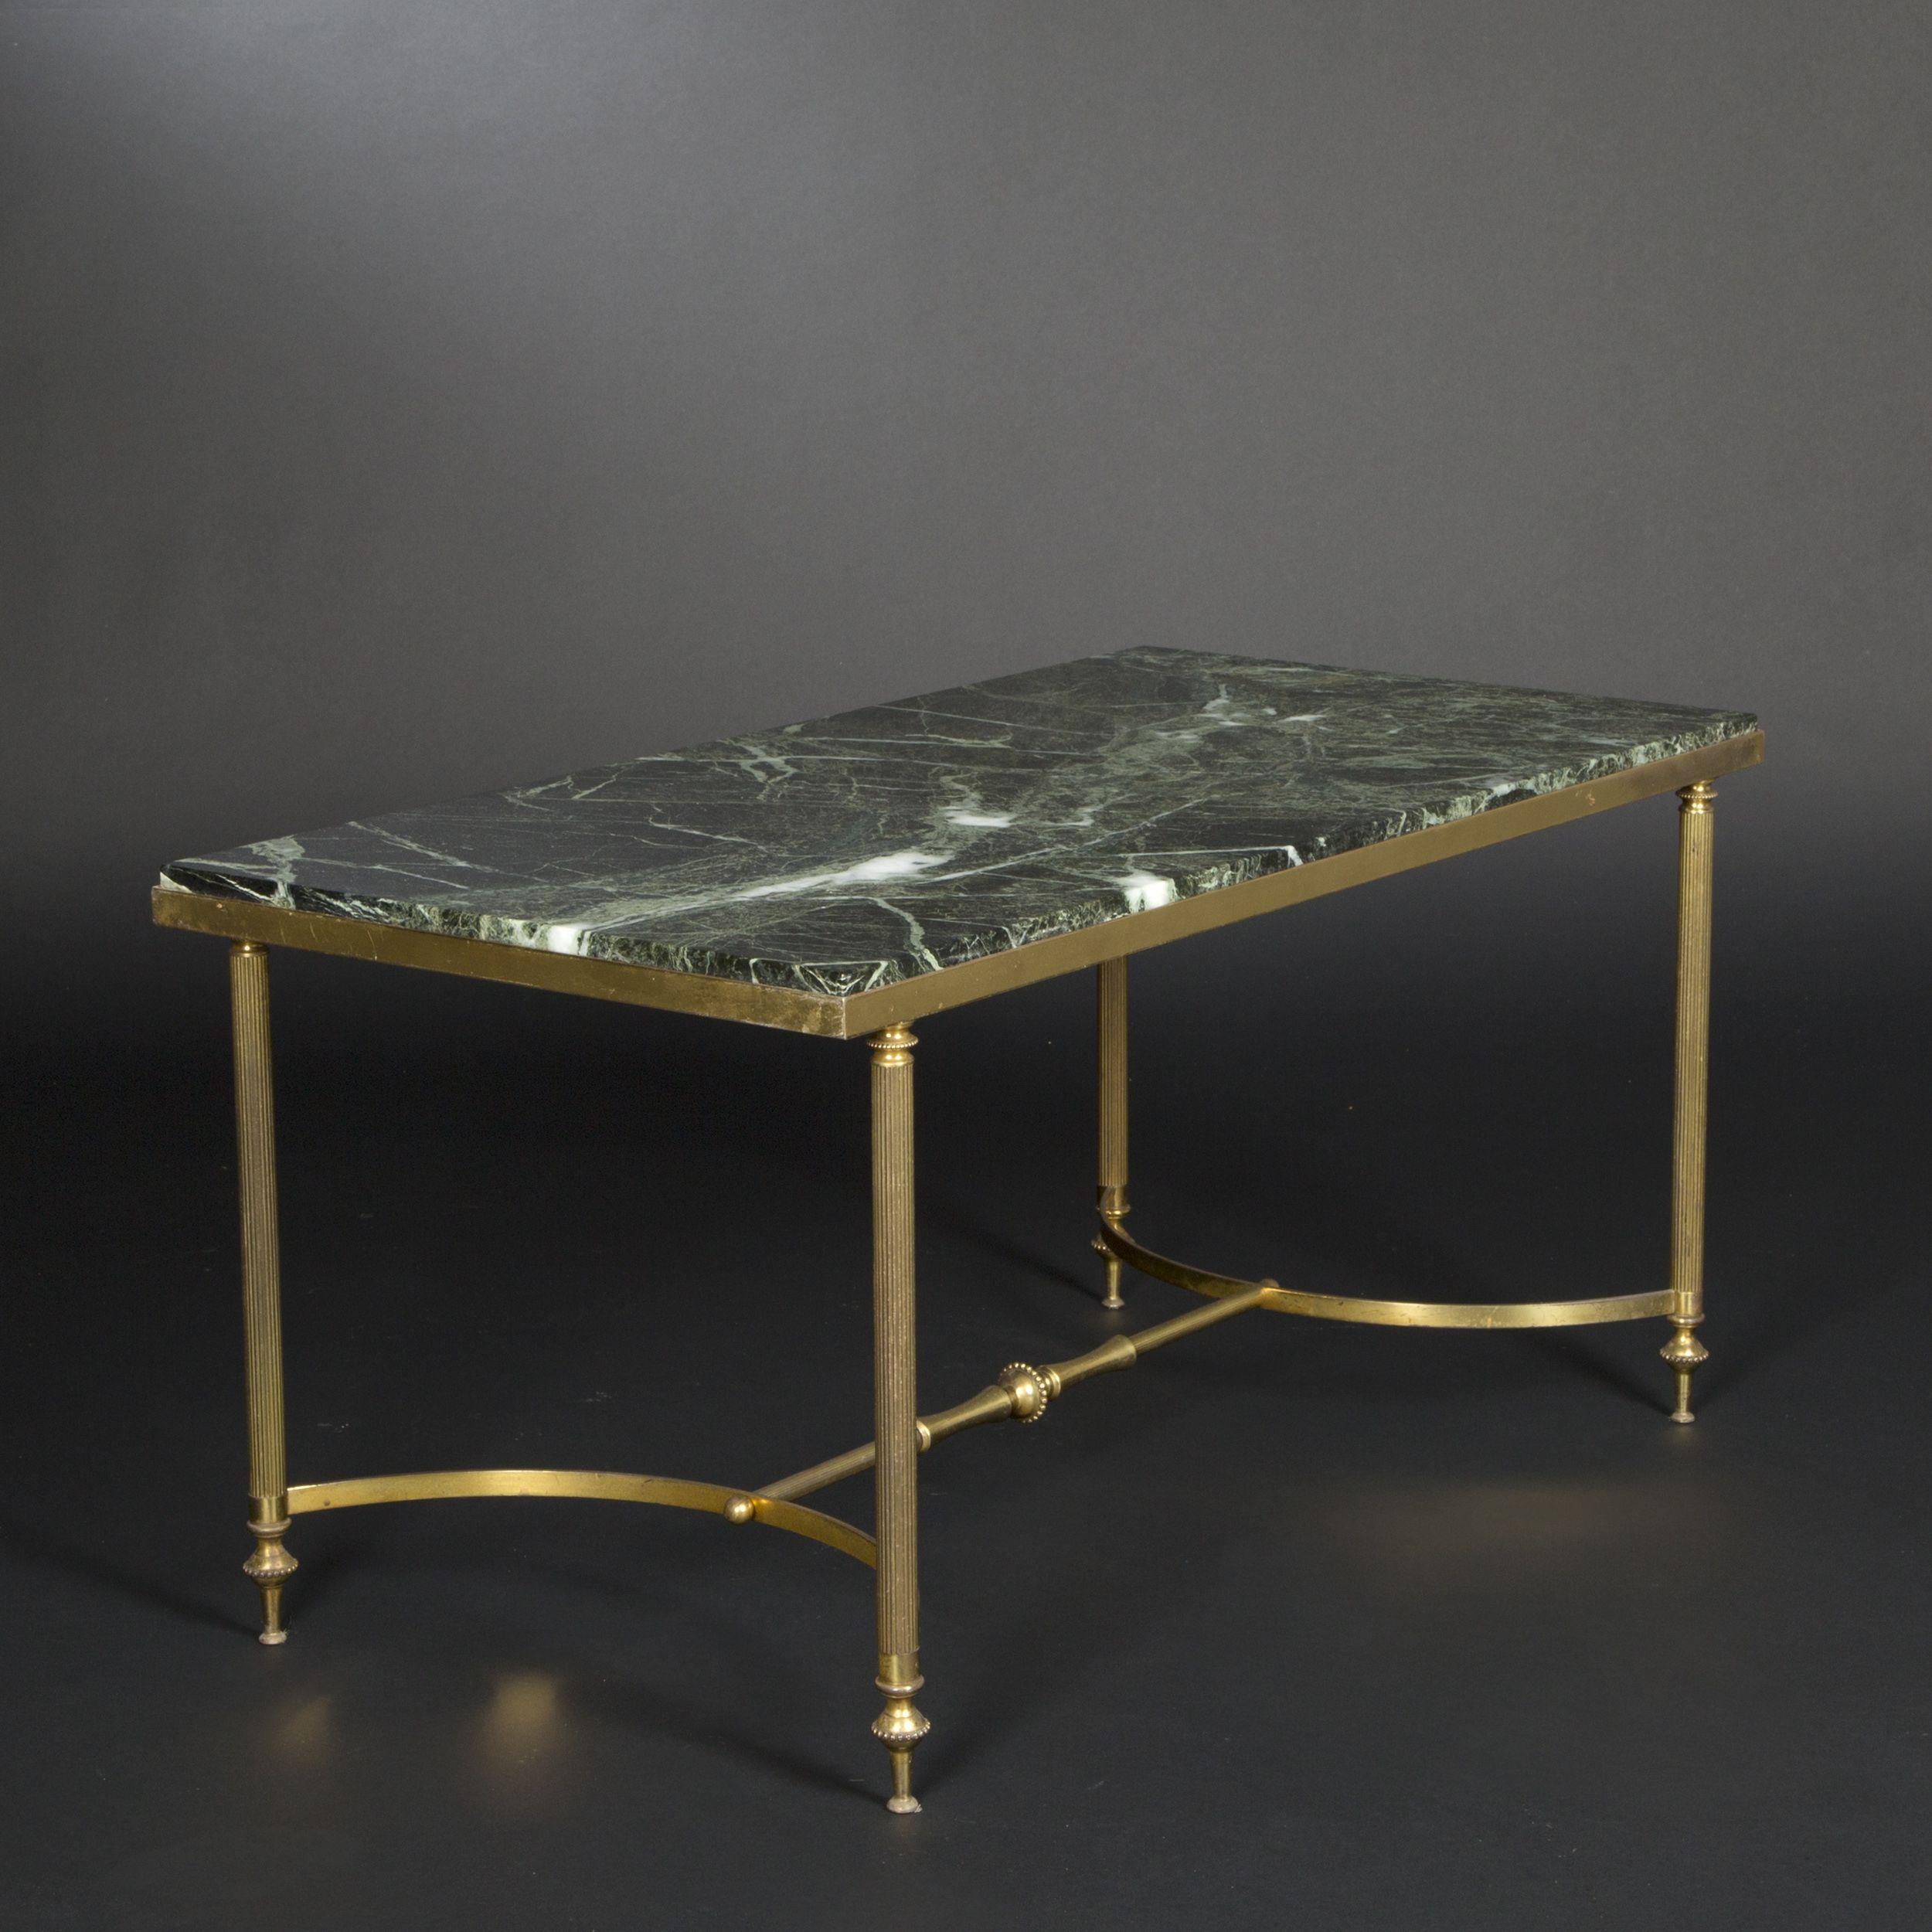 Table Basse En Marbre Vert Lille Menagefr Maison